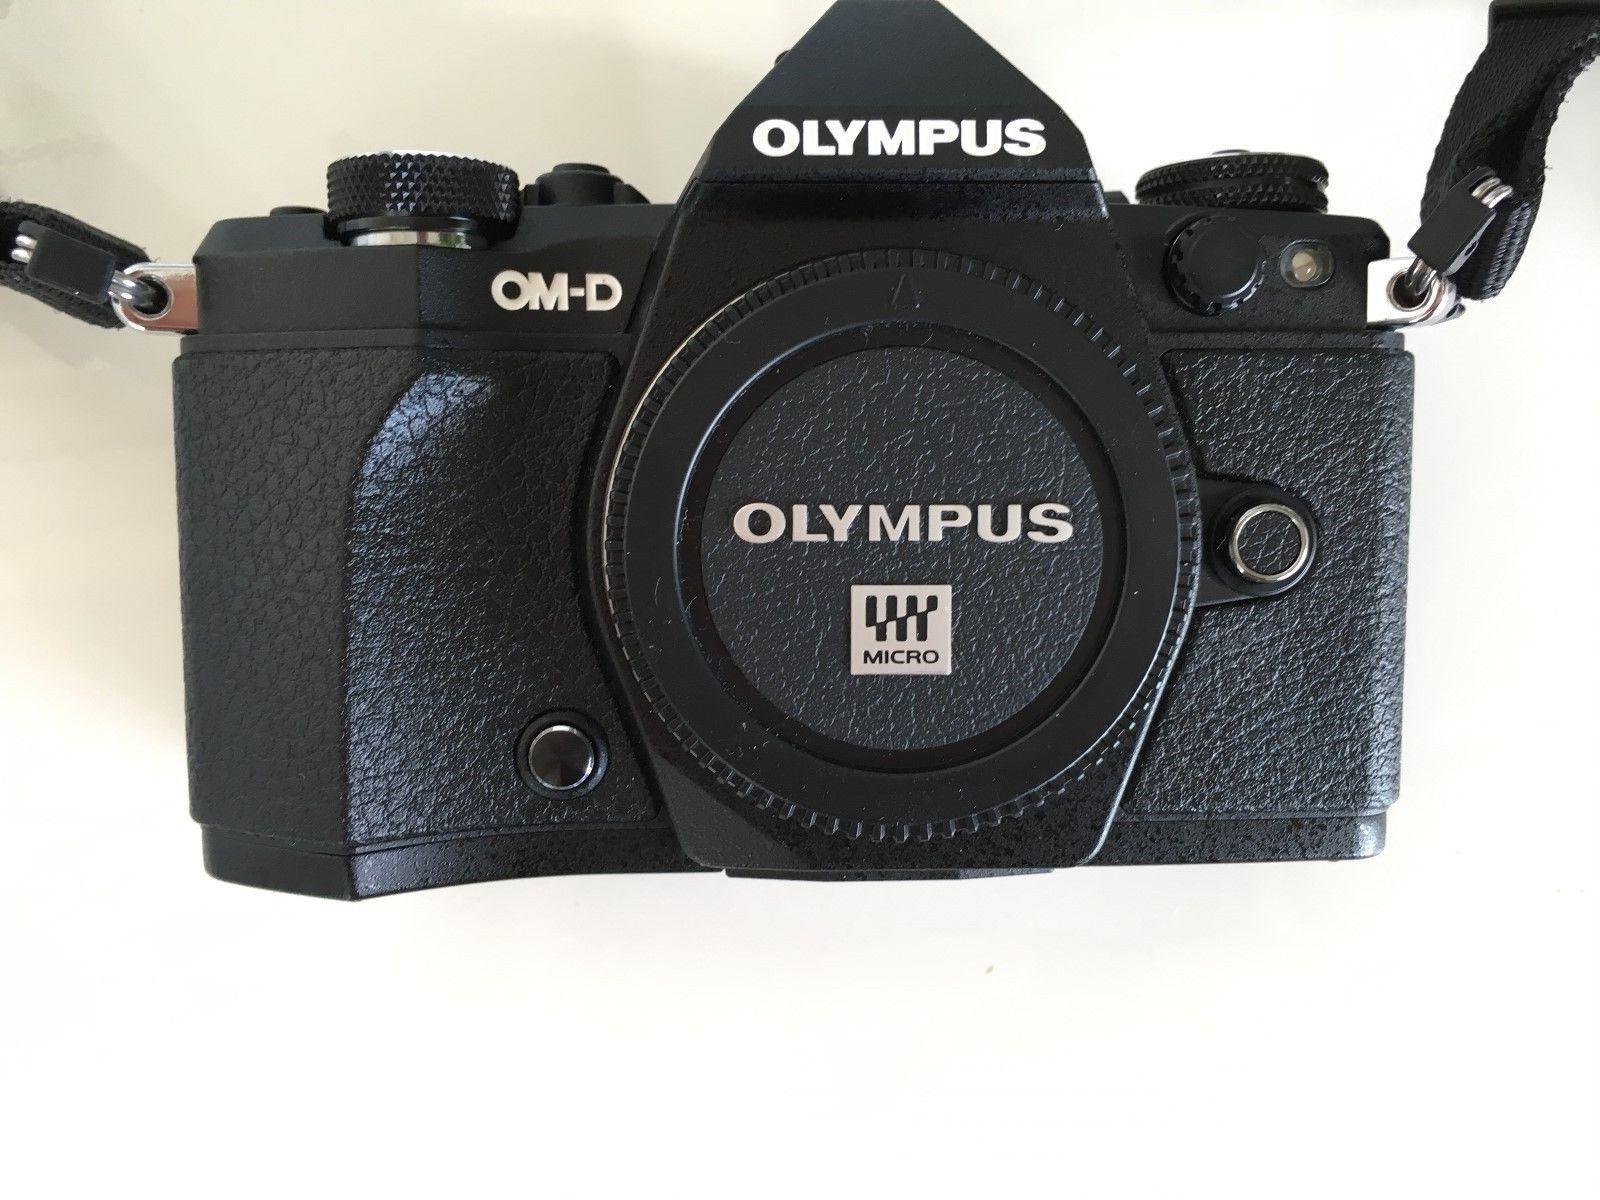 Olympus OM-D E-M5 II 16.1MP Digitalkamera - Schwarz (Nur Gehäuse) Neuwertig